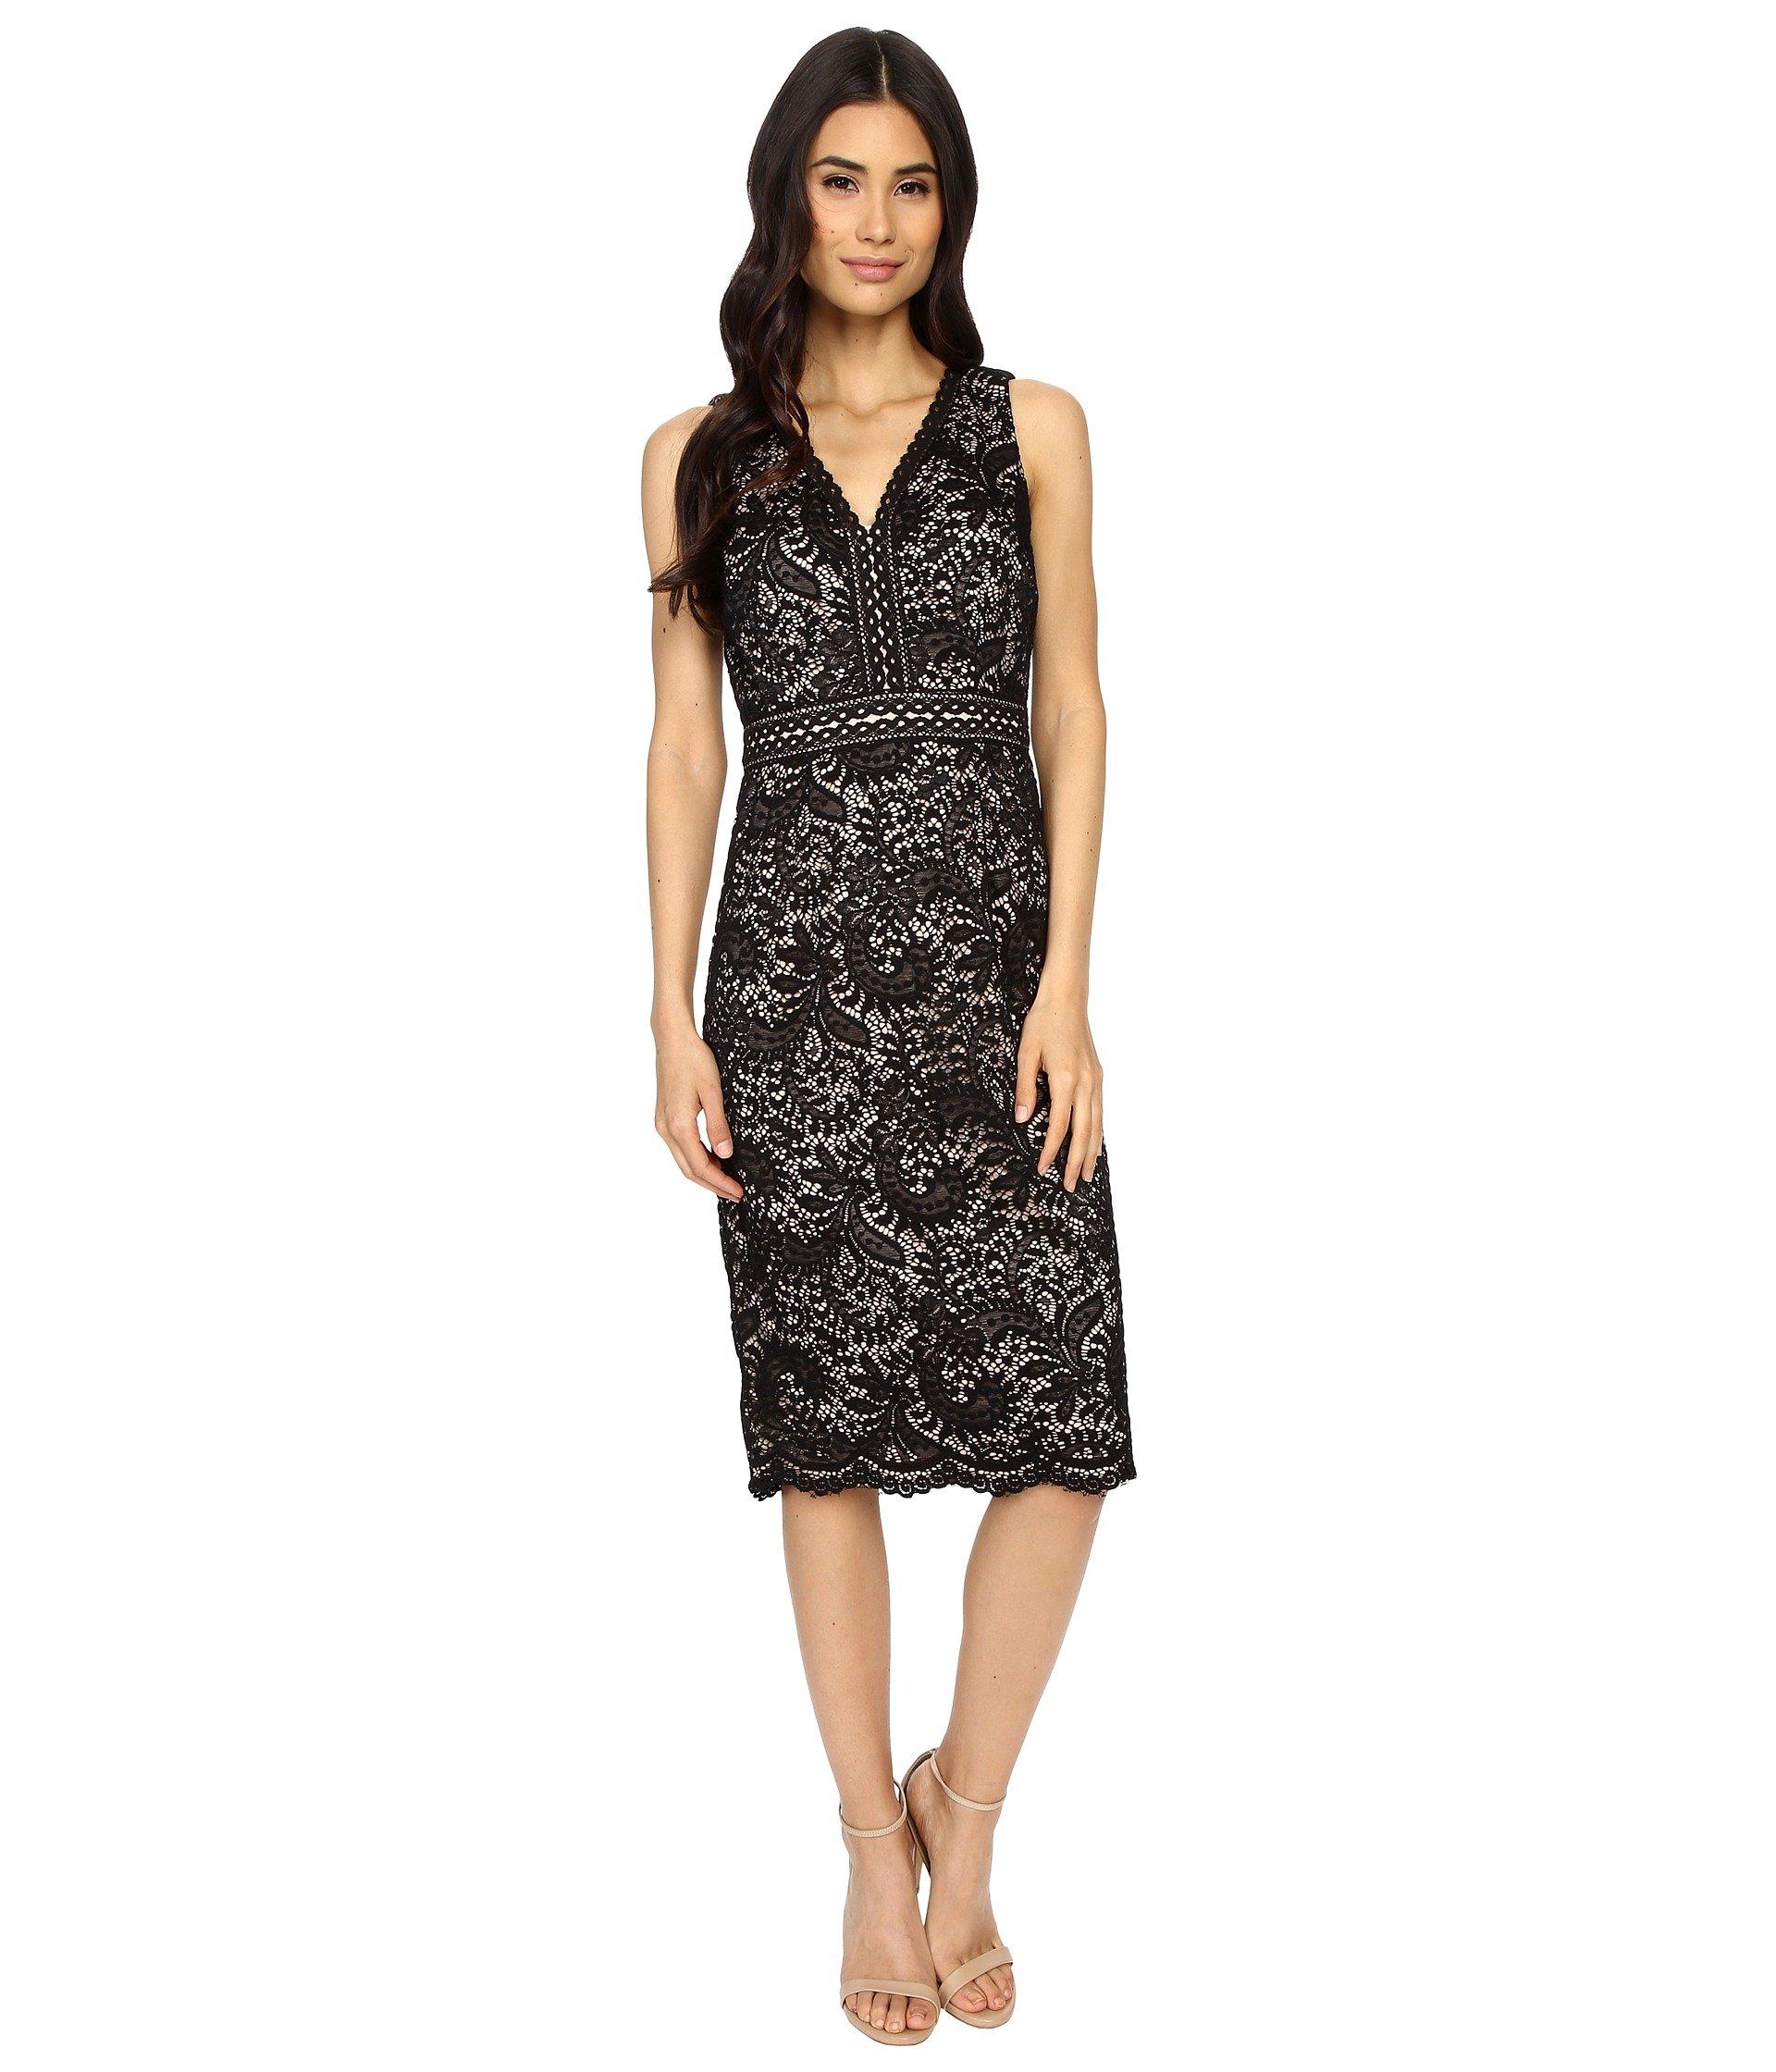 Maggy london sleeveless illusion-lace dresses